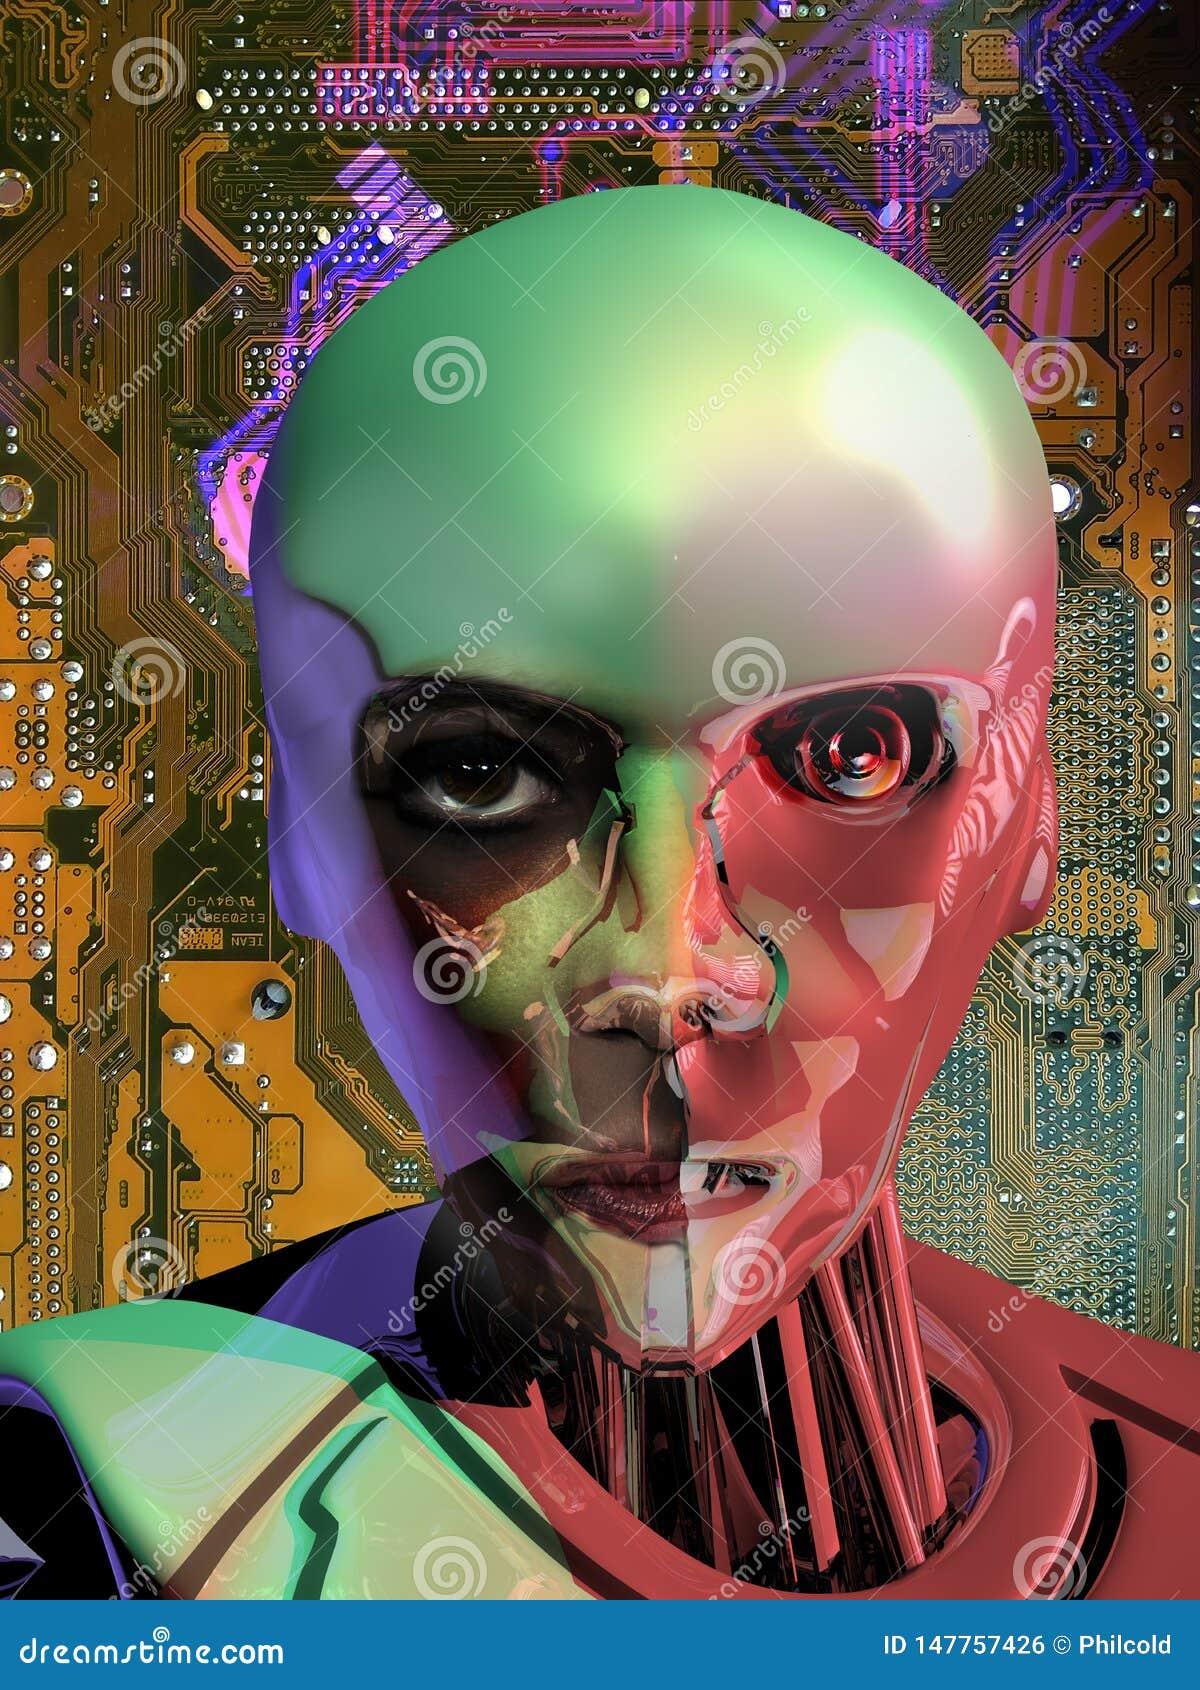 Android cerca de la inteligencia humana